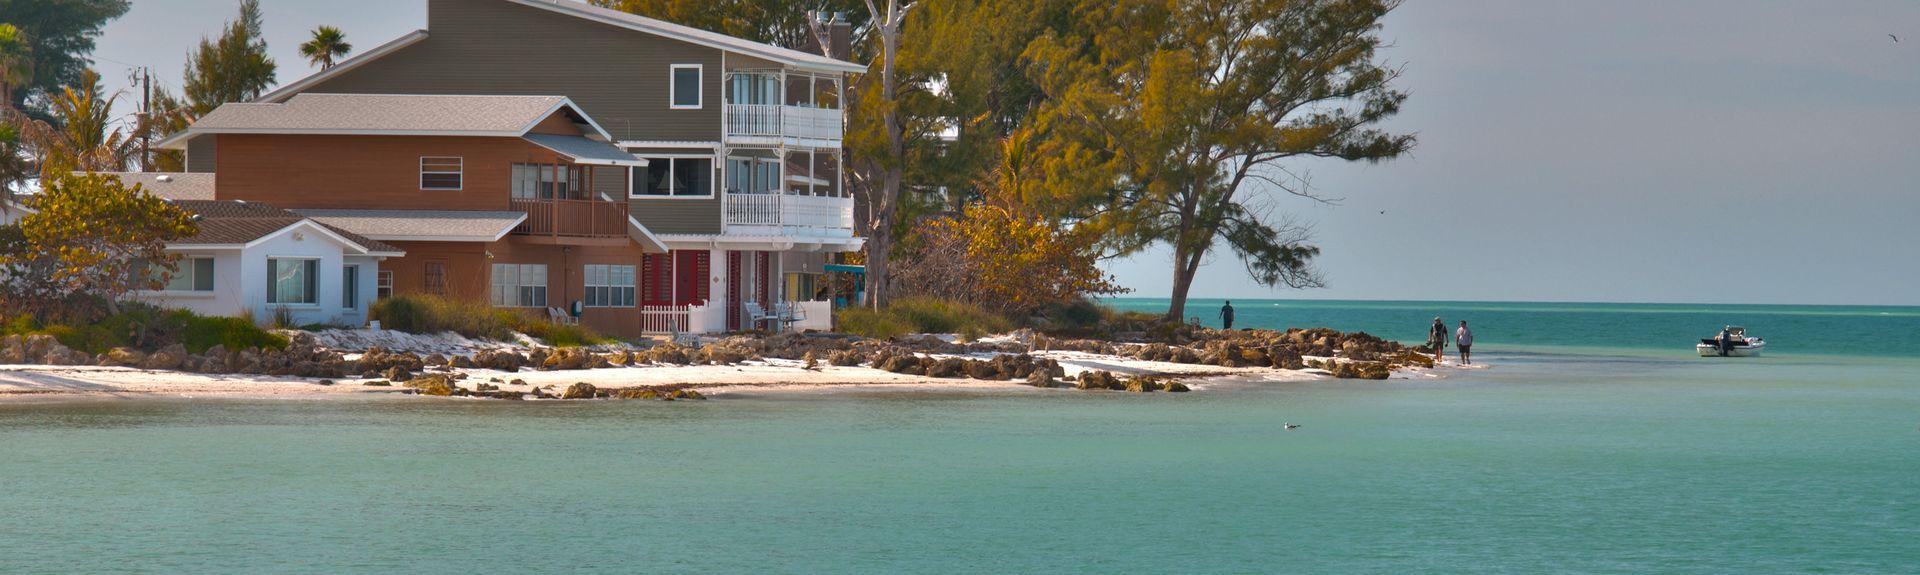 Holmes Beach, FL, USA